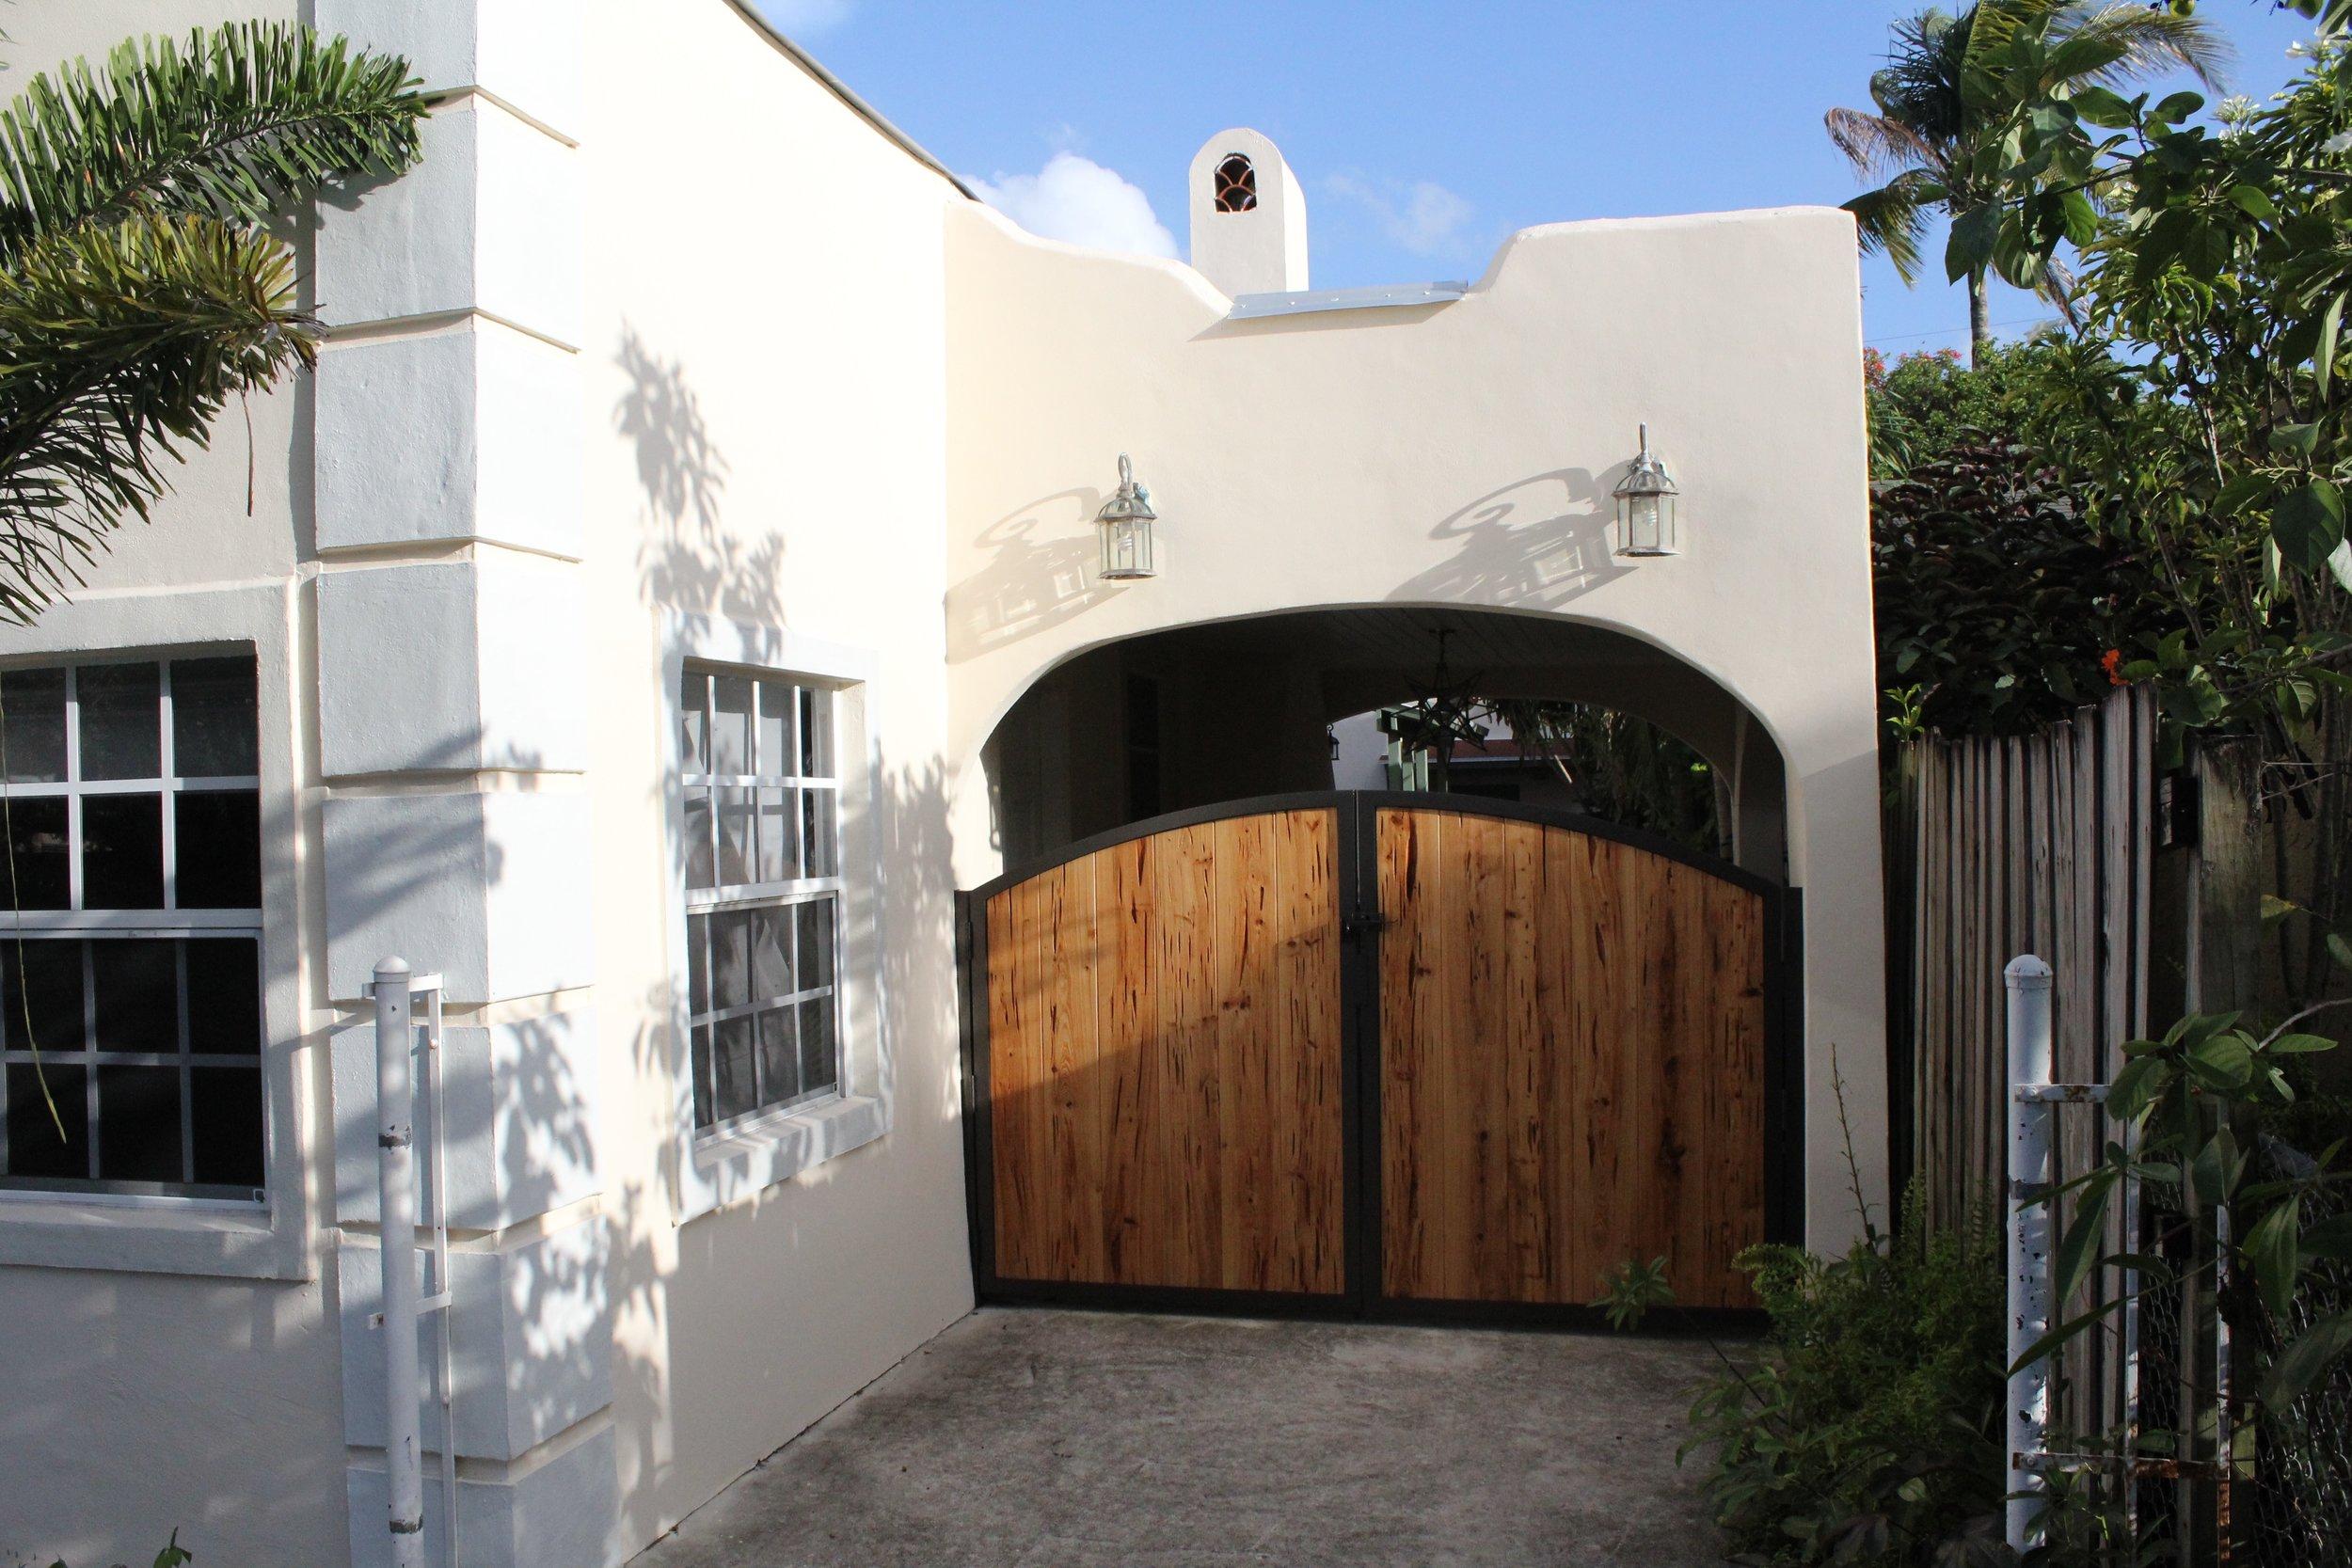 ALUMINUM & PECKY GATES / HISTORIC WEST PALM / FALL 2015 -